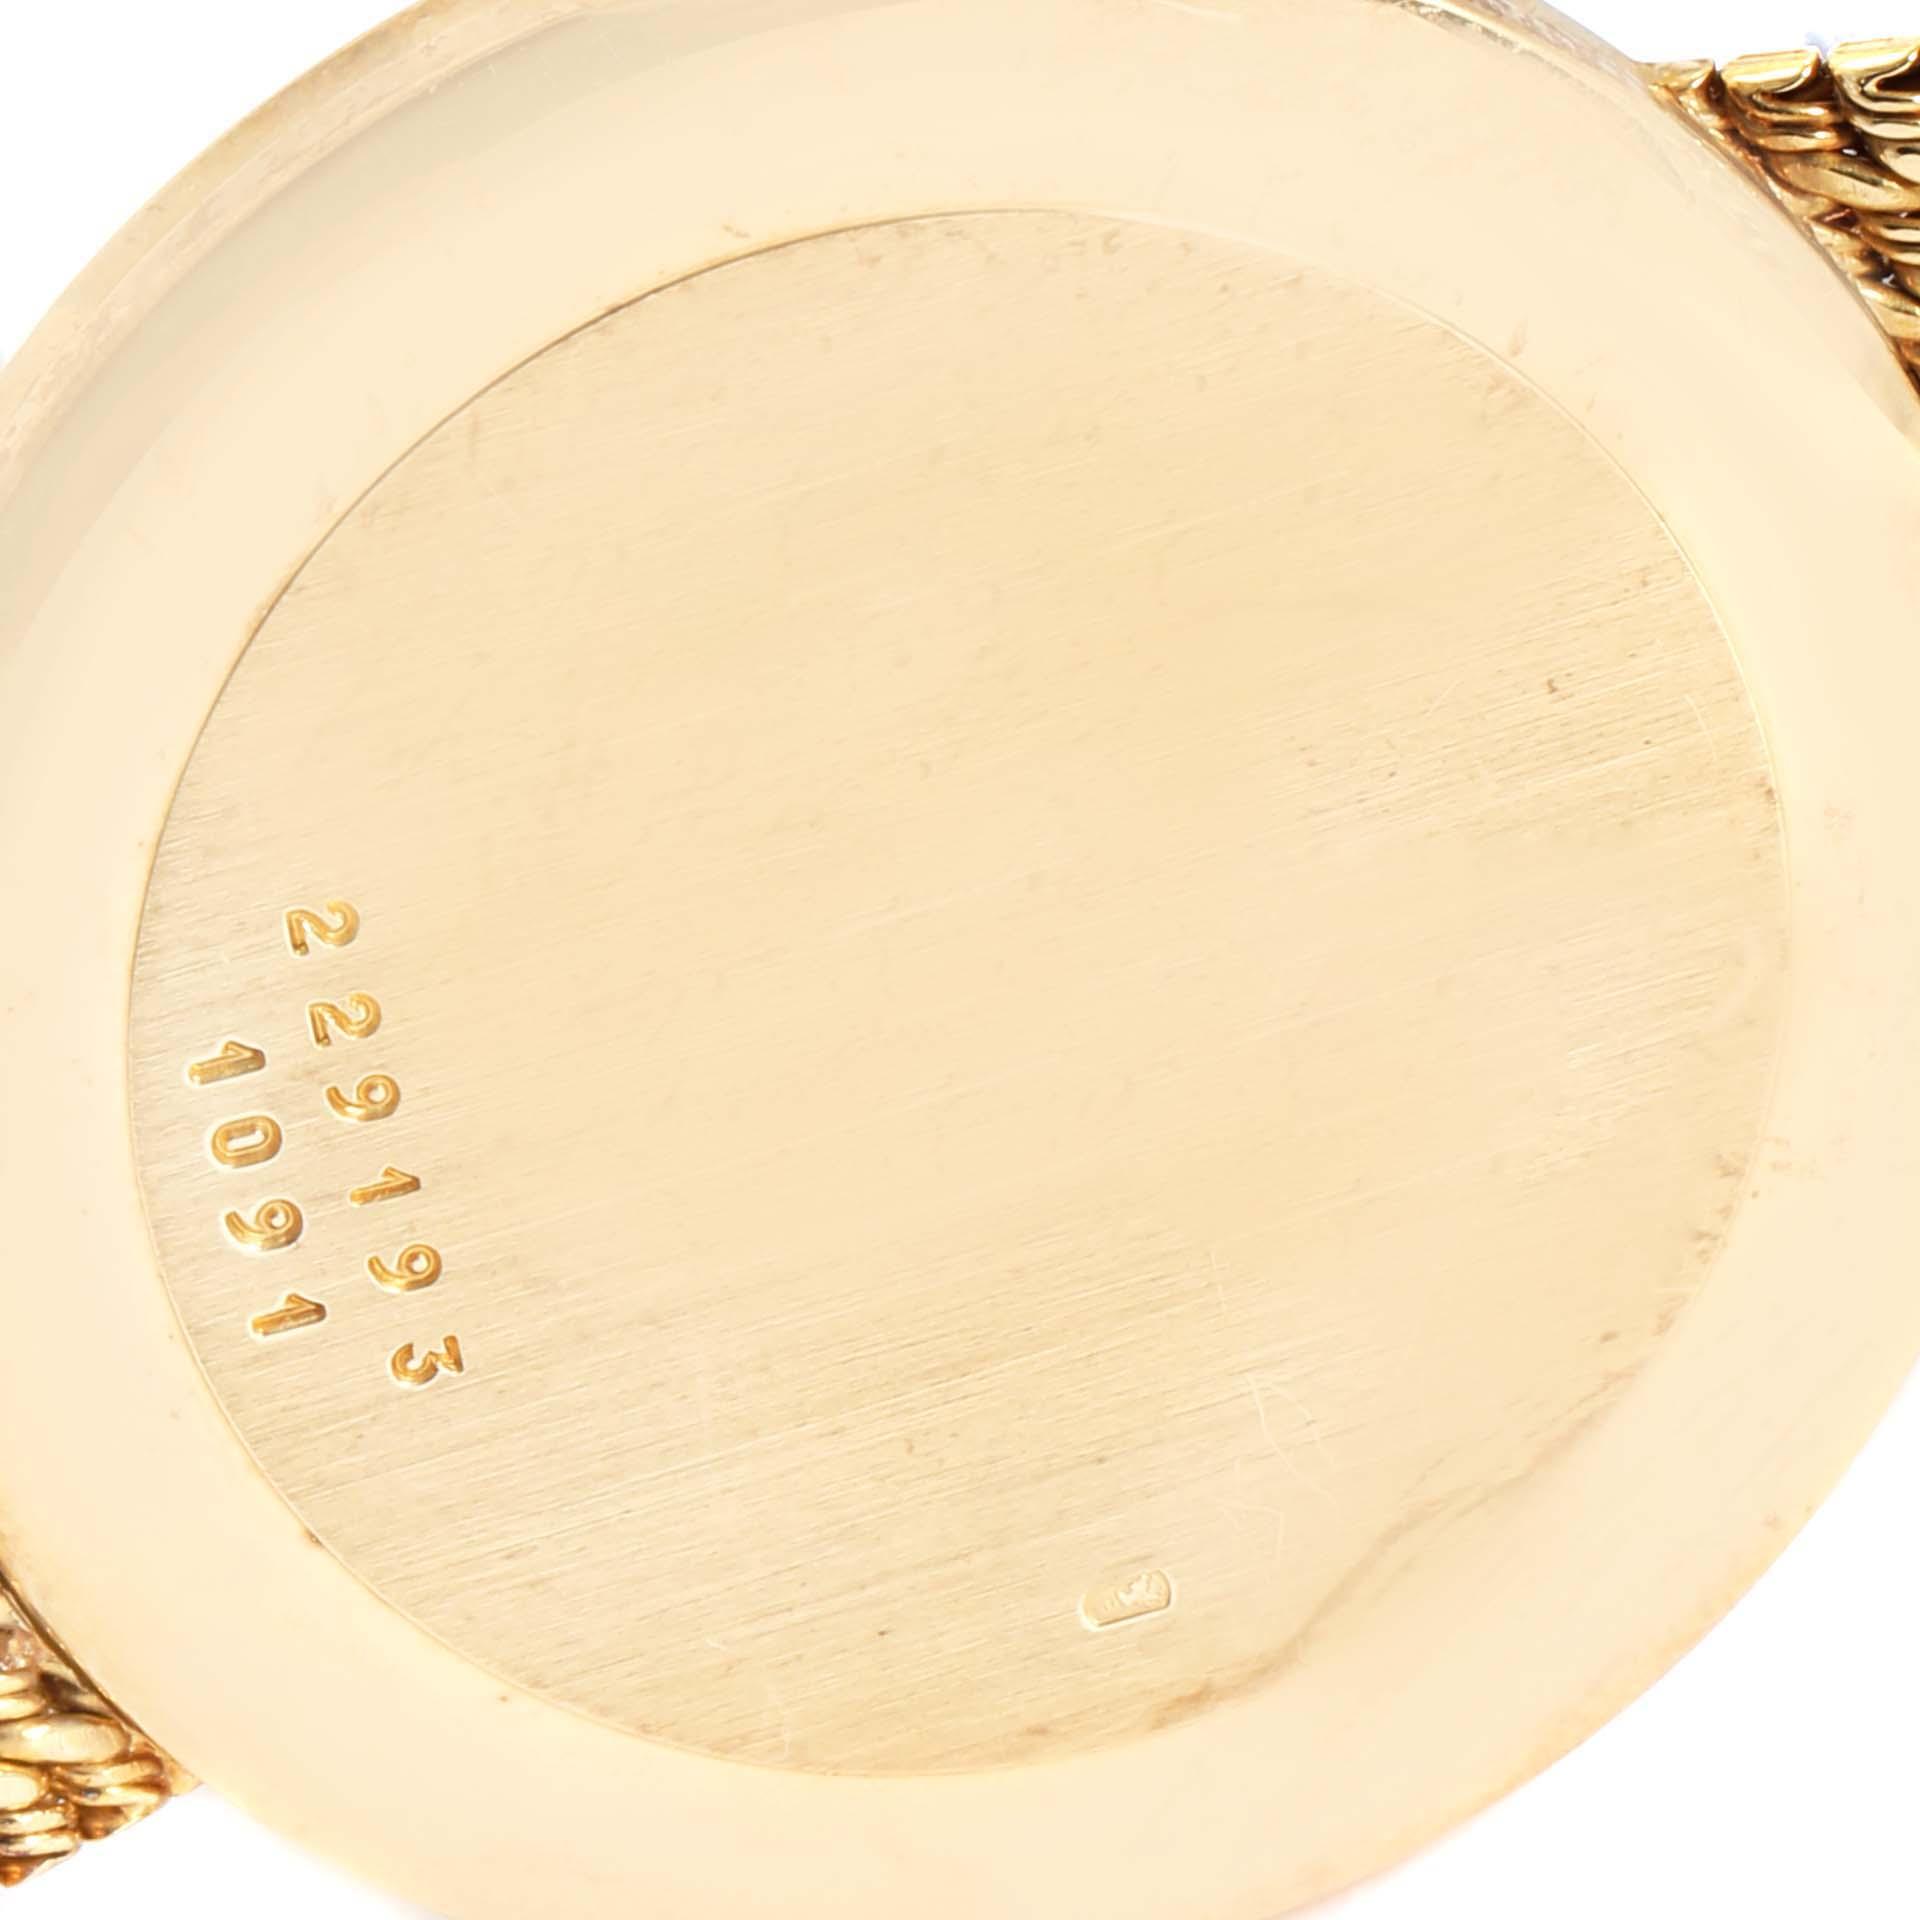 Chopard Classique 18K Yellow Gold Quartz Mens Watch 1091 SwissWatchExpo